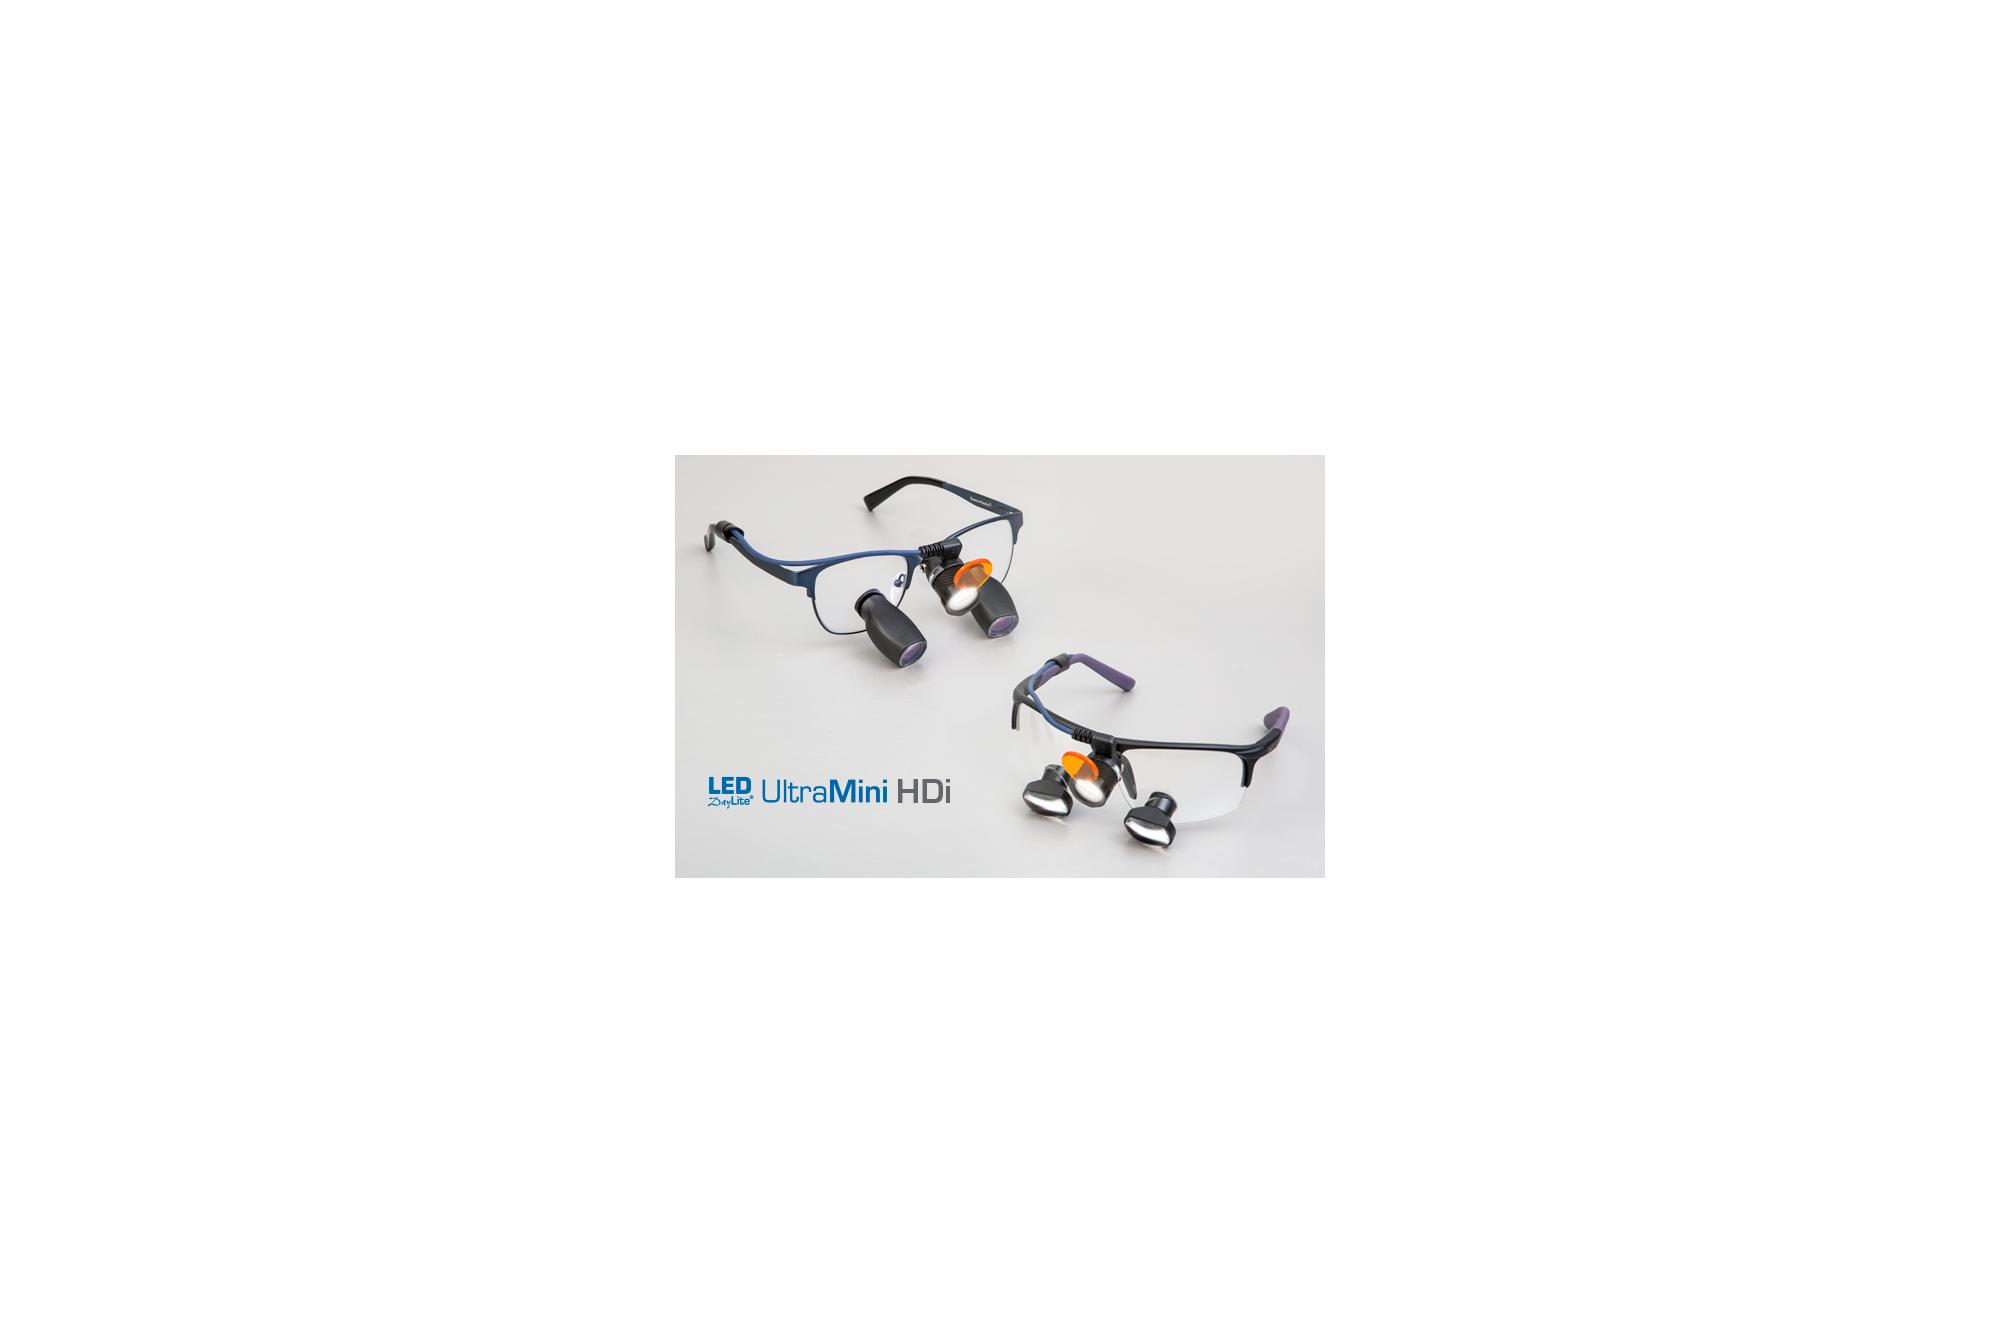 Chirurgische Lupenbrille von Designs for Vision, Beleuchuntssystem LED DayLite® UltraMini HDi